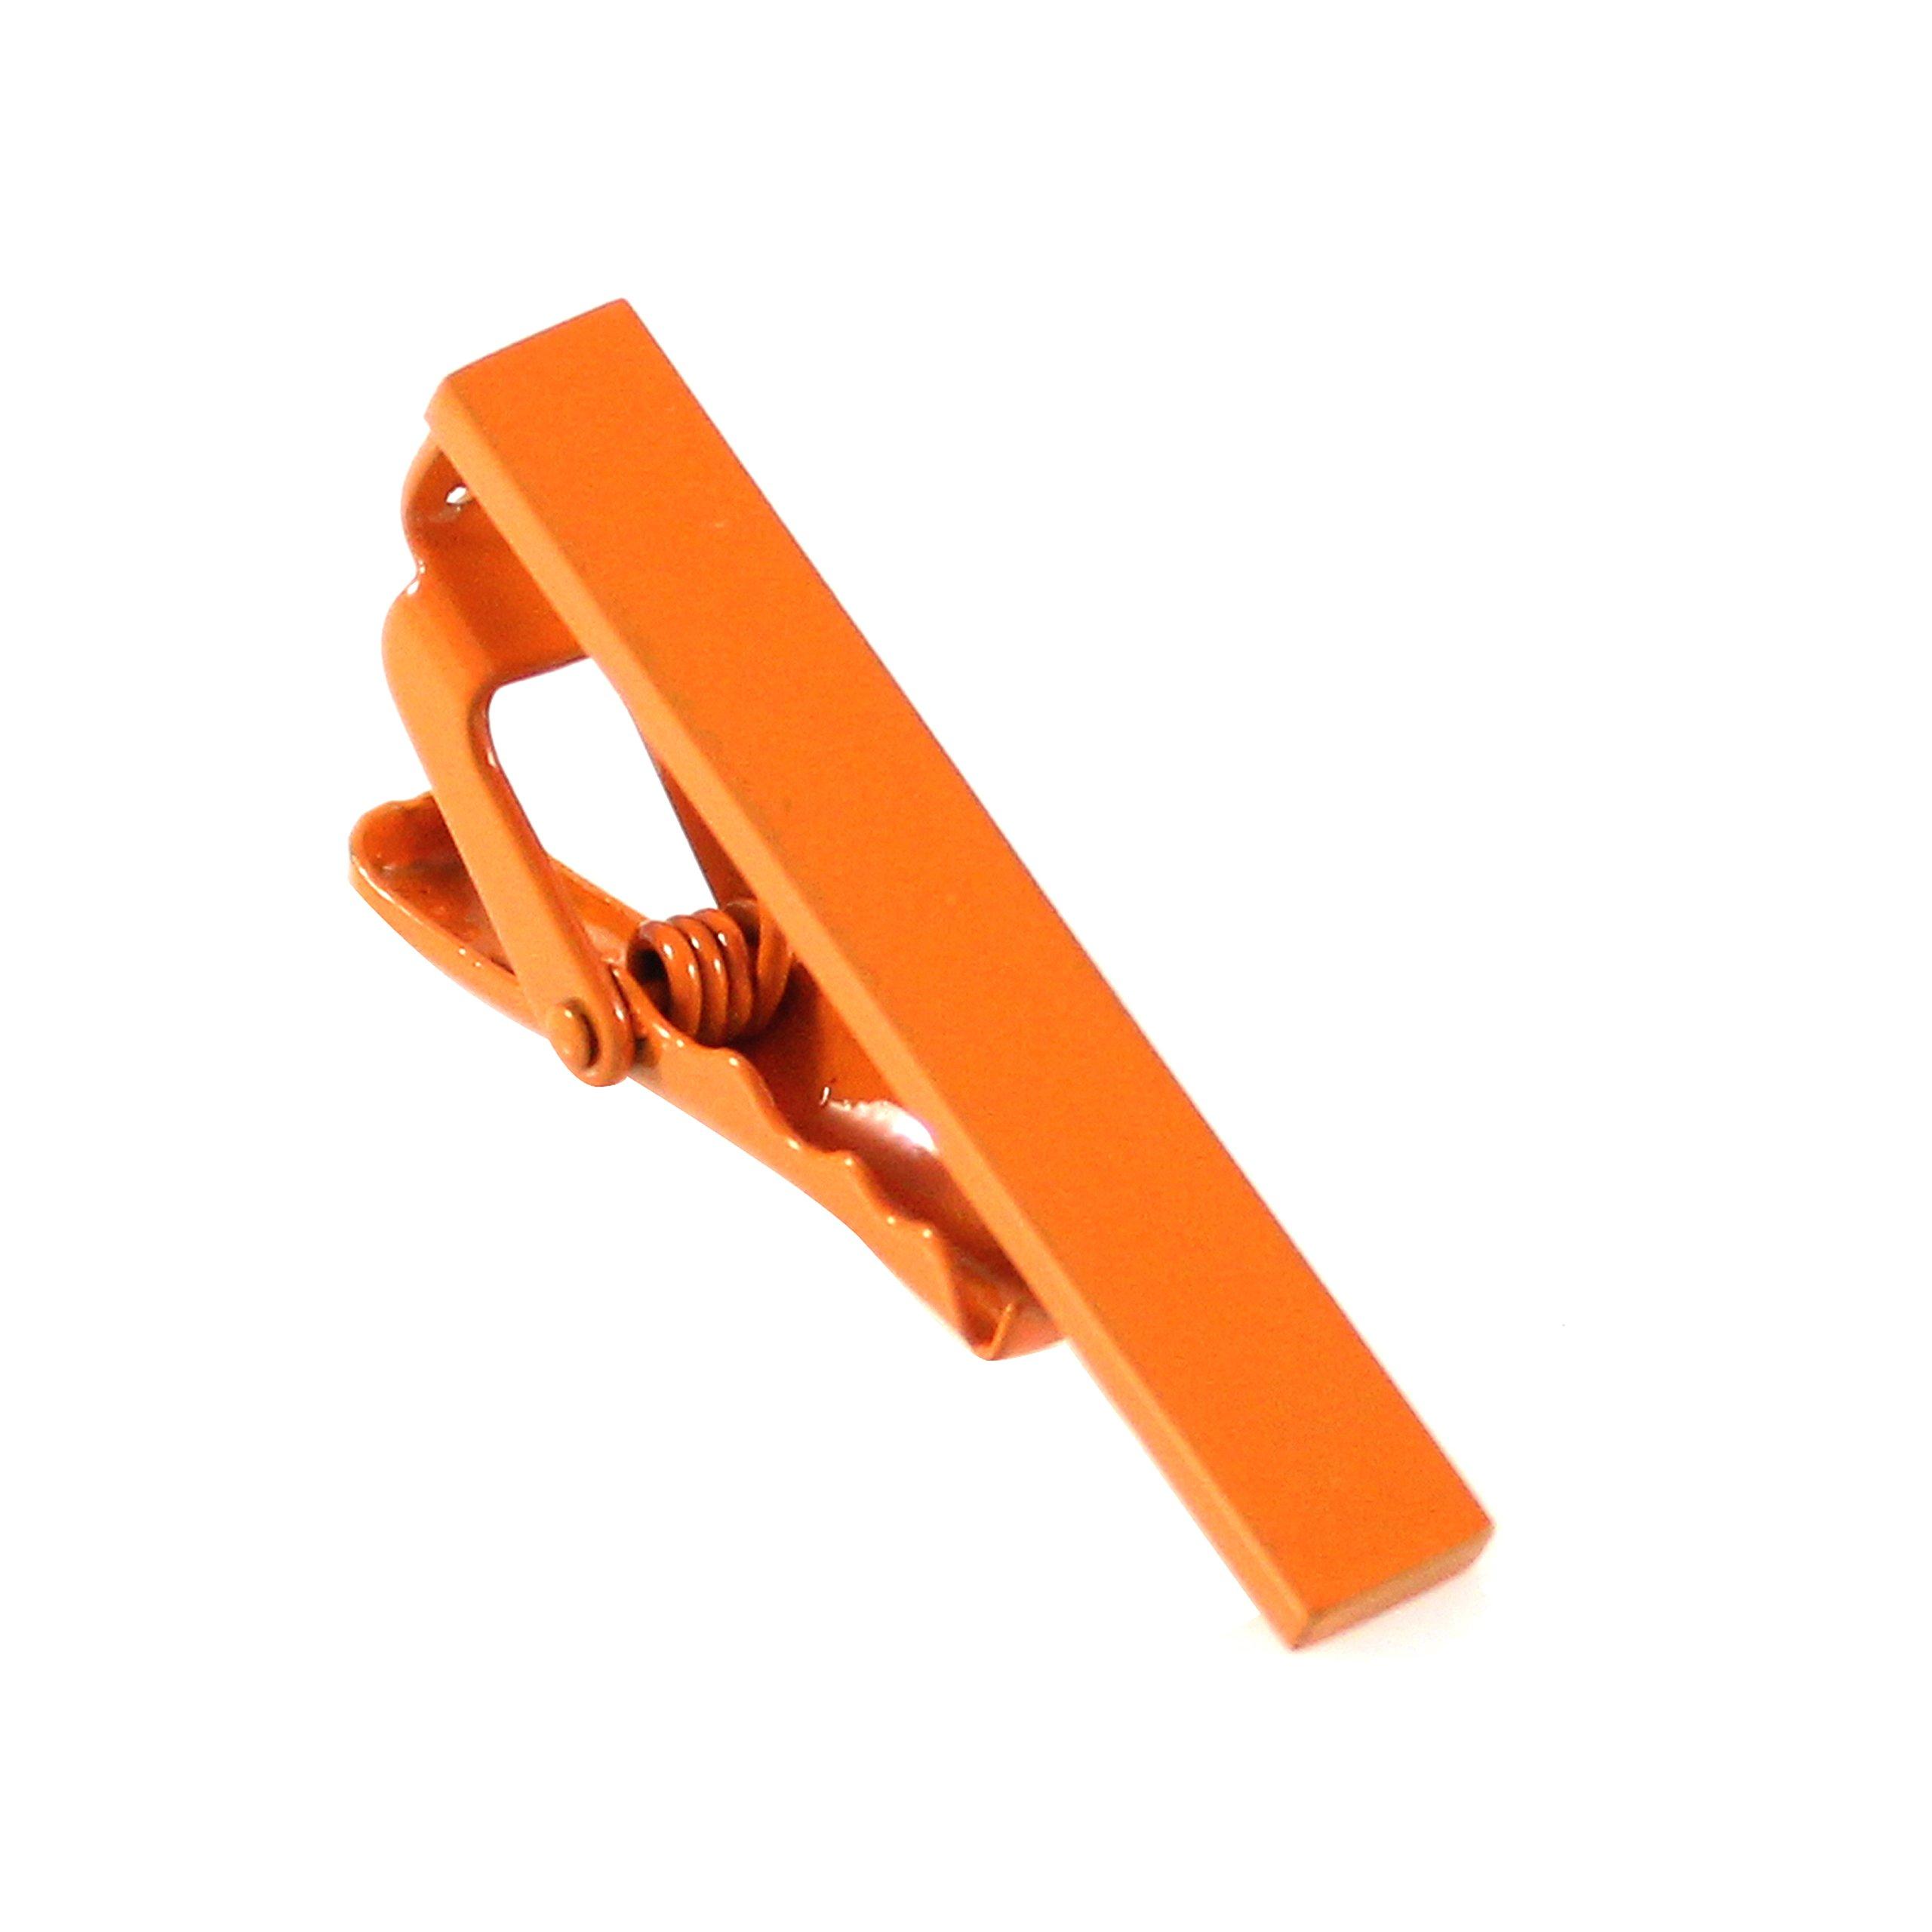 MENDEPOT Color Tie Clip 40mm Color Sprayed Tie Bar Seven Colors Optional (Orange)